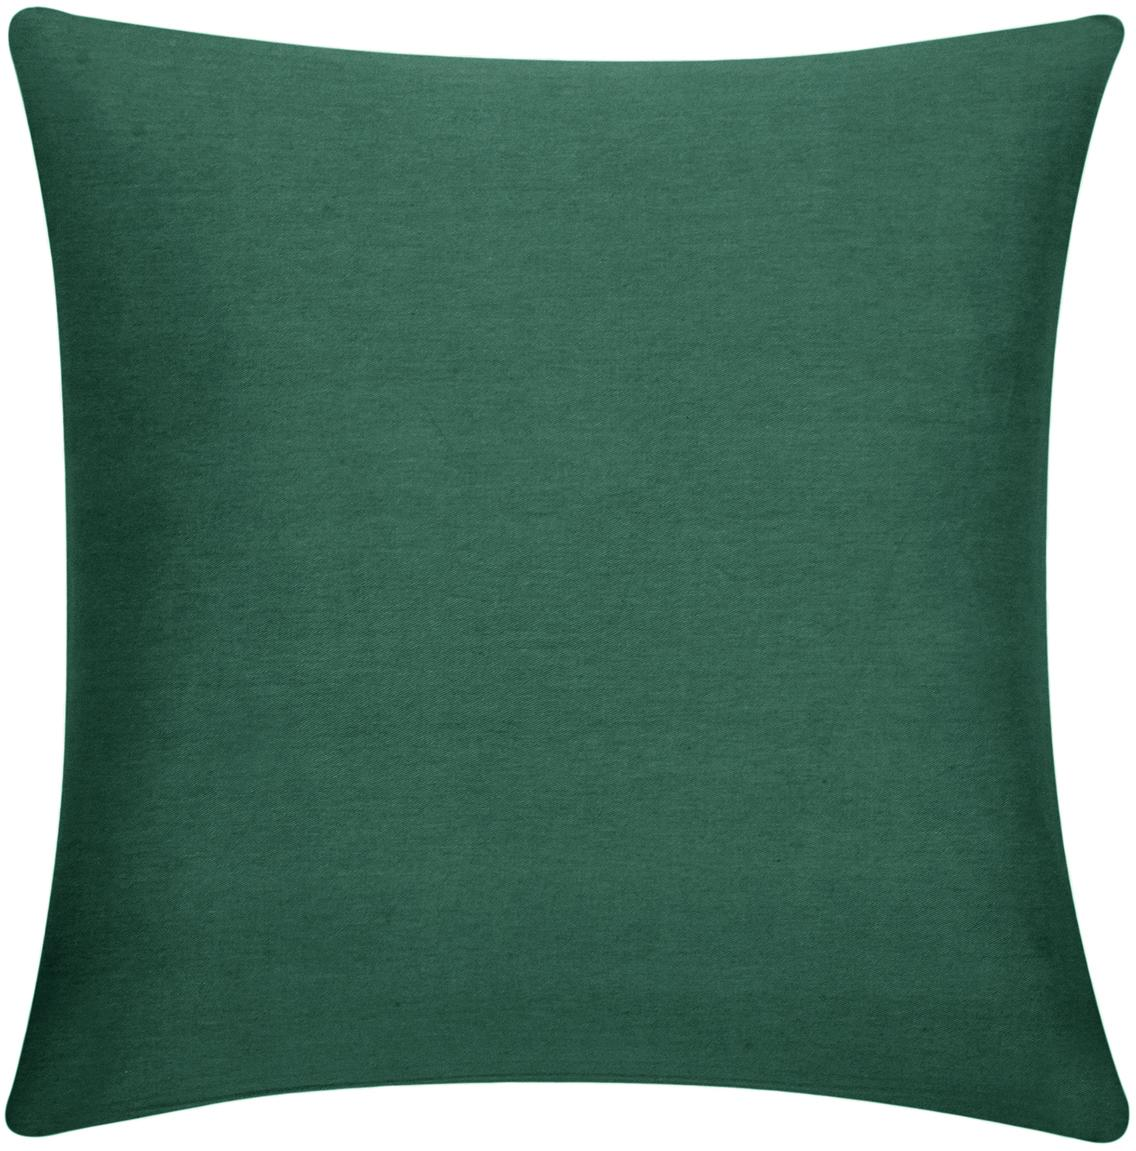 Federa arredo in cotone  verde Mads, 100% cotone, Verde, Larg. 40 x Lung. 40 cm